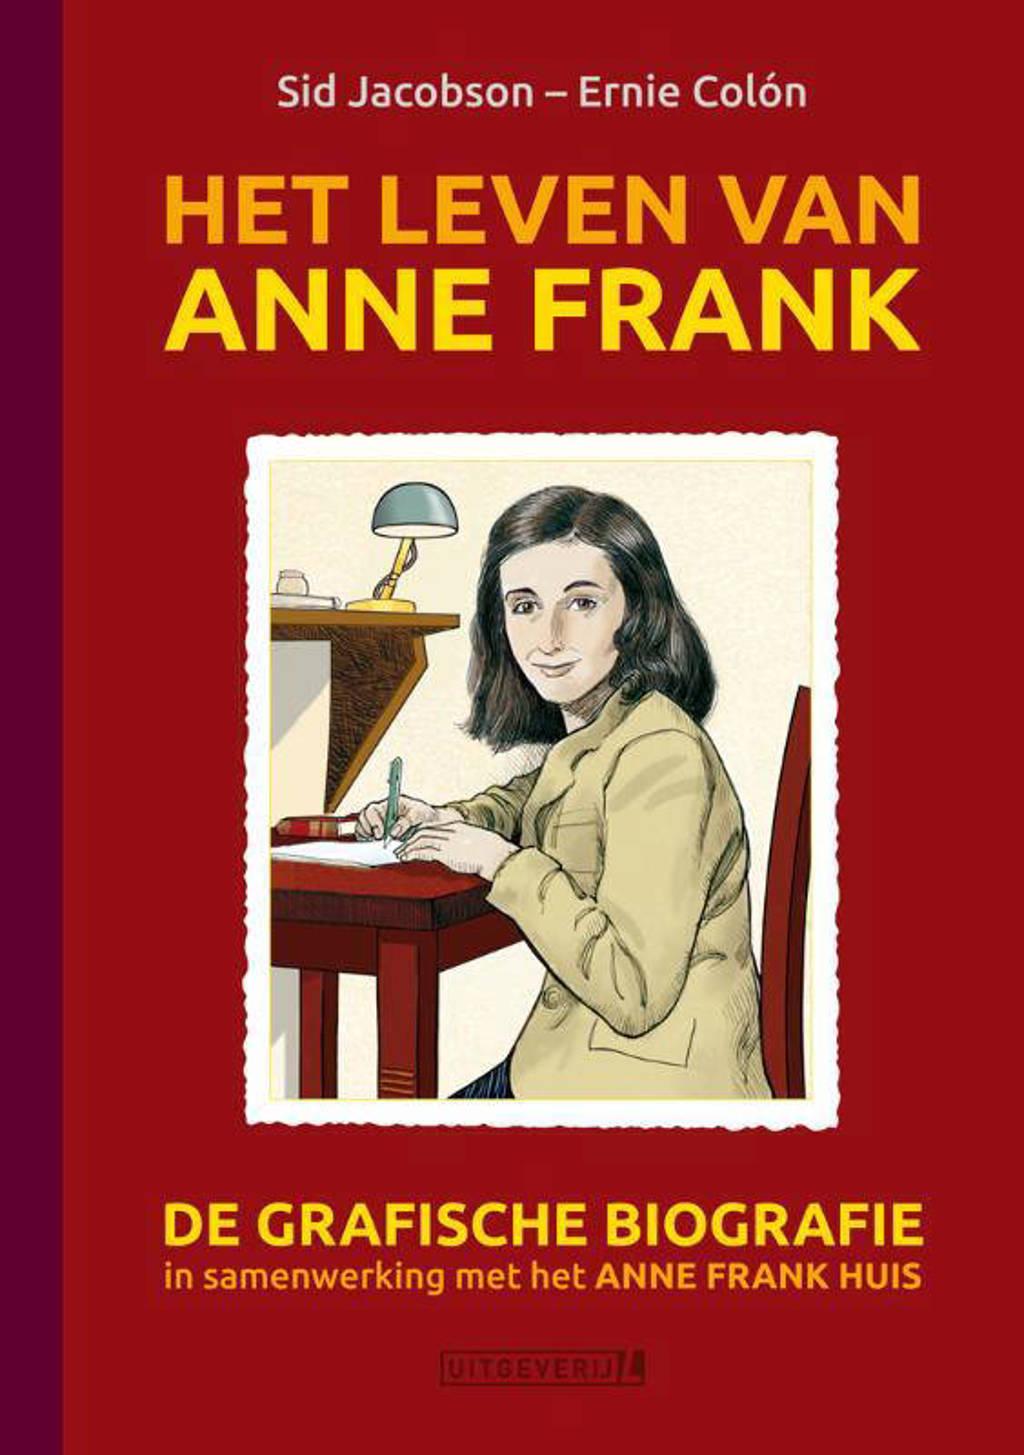 Het leven van Anne Frank - Sid Jacobson